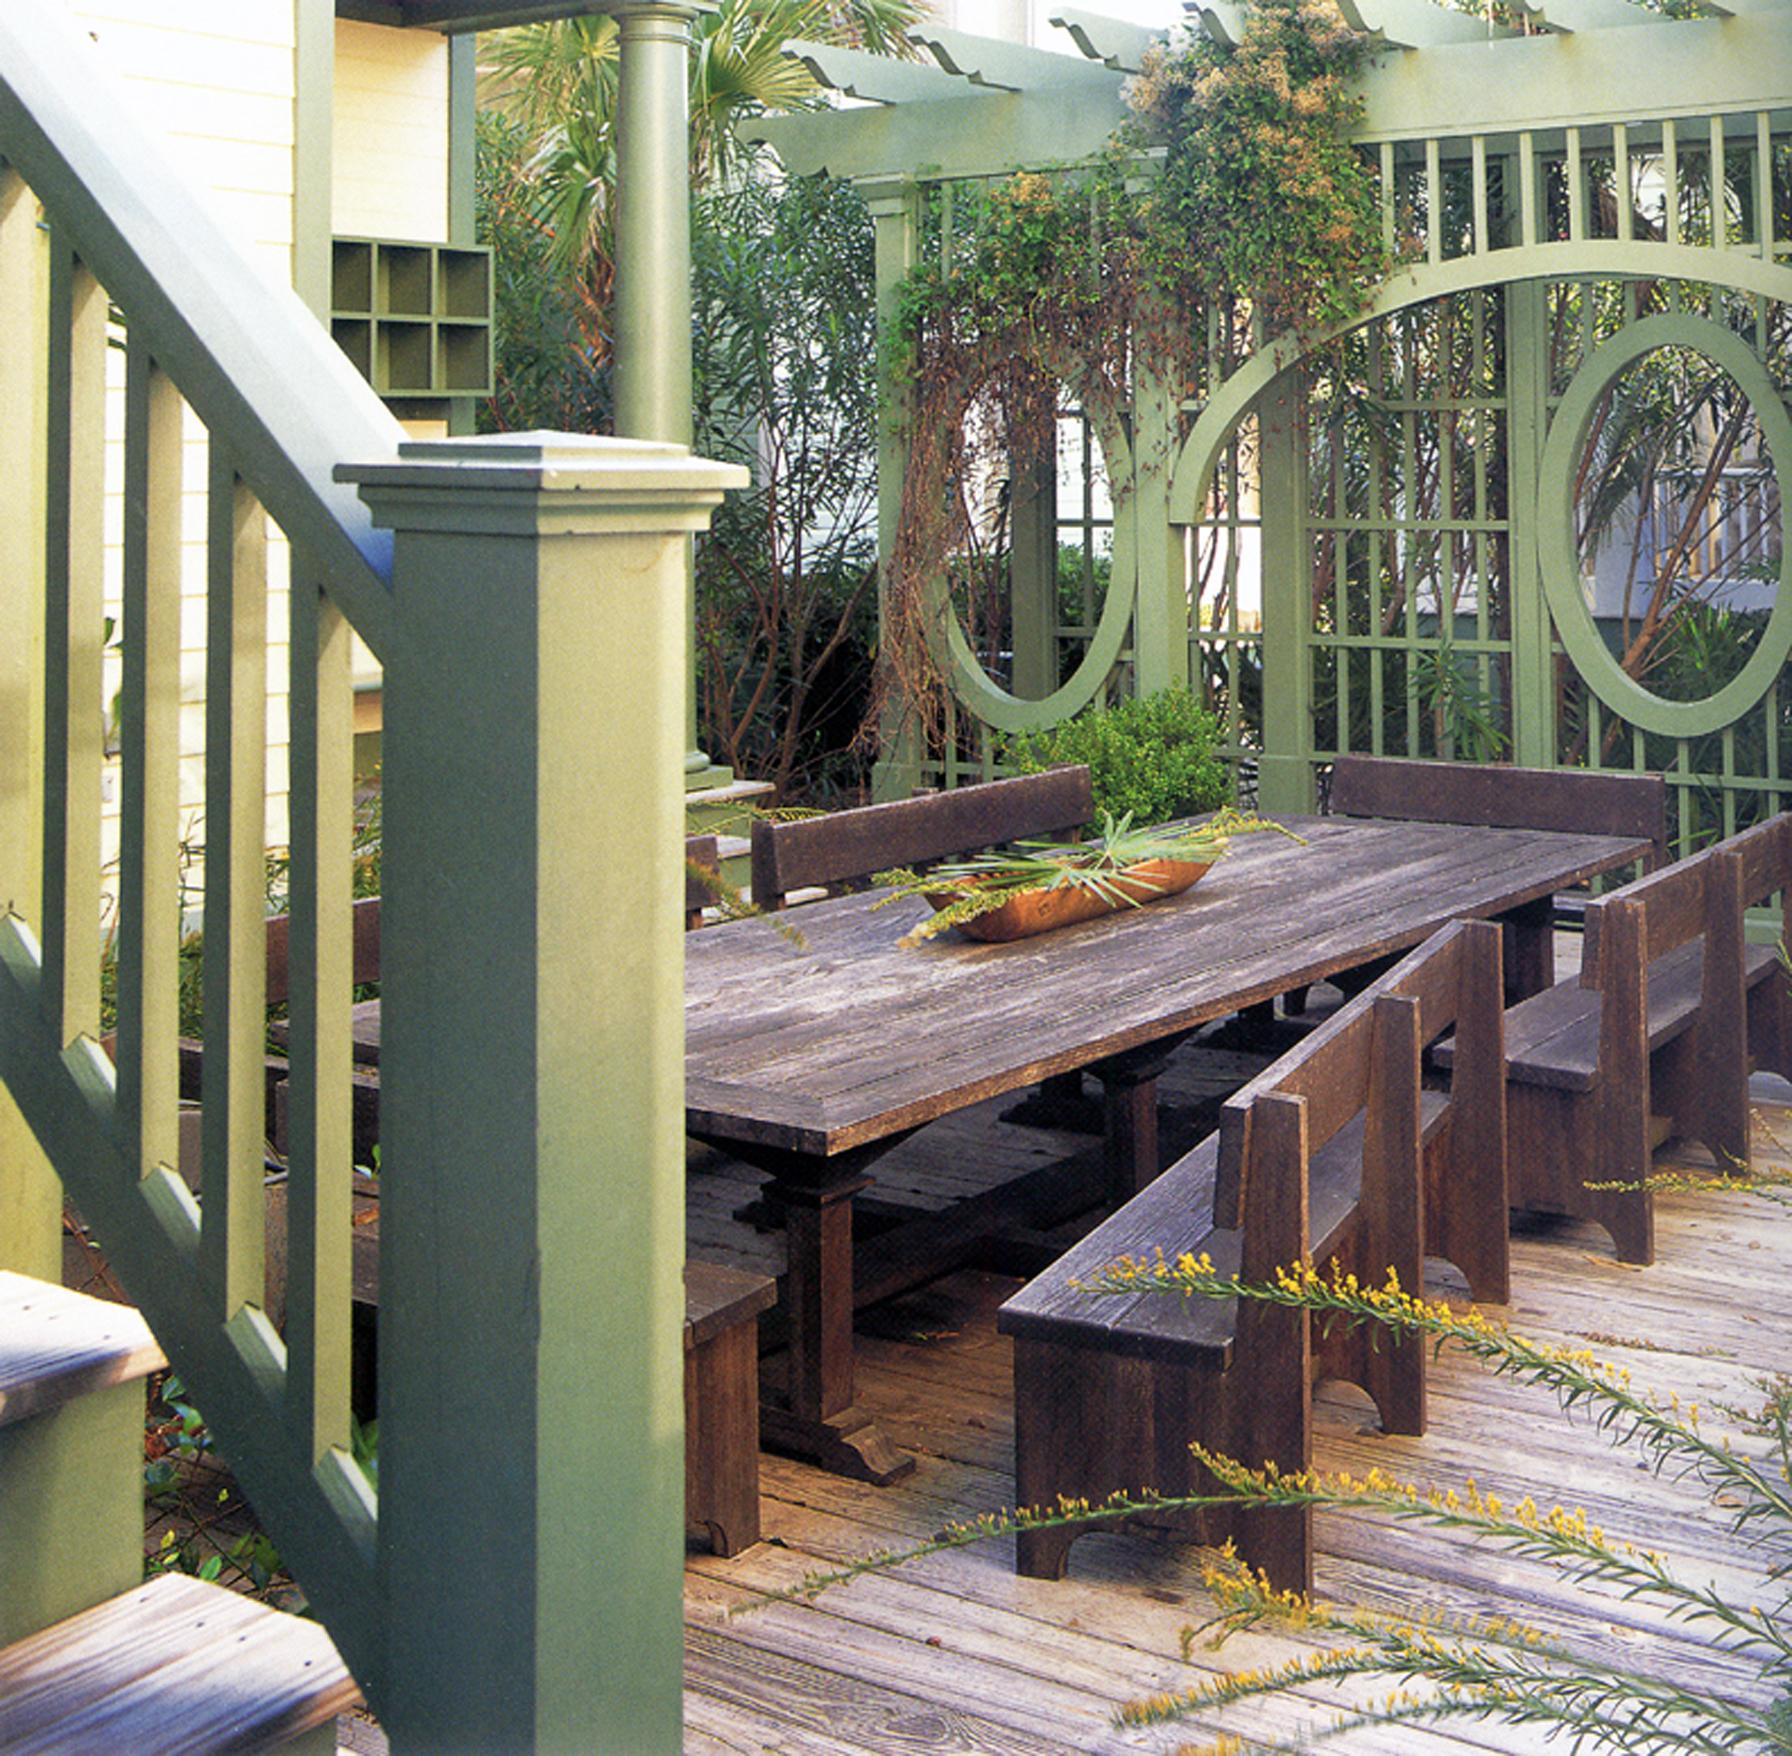 Seaside_Florida.Beach.Natchez_House.New_Urbanism.CNU.Courtyard.Walkable.Robert_Orr_&_Associates.Architecture.Landscape_Architecture.Urbanism.Picnic_TableA.jpg